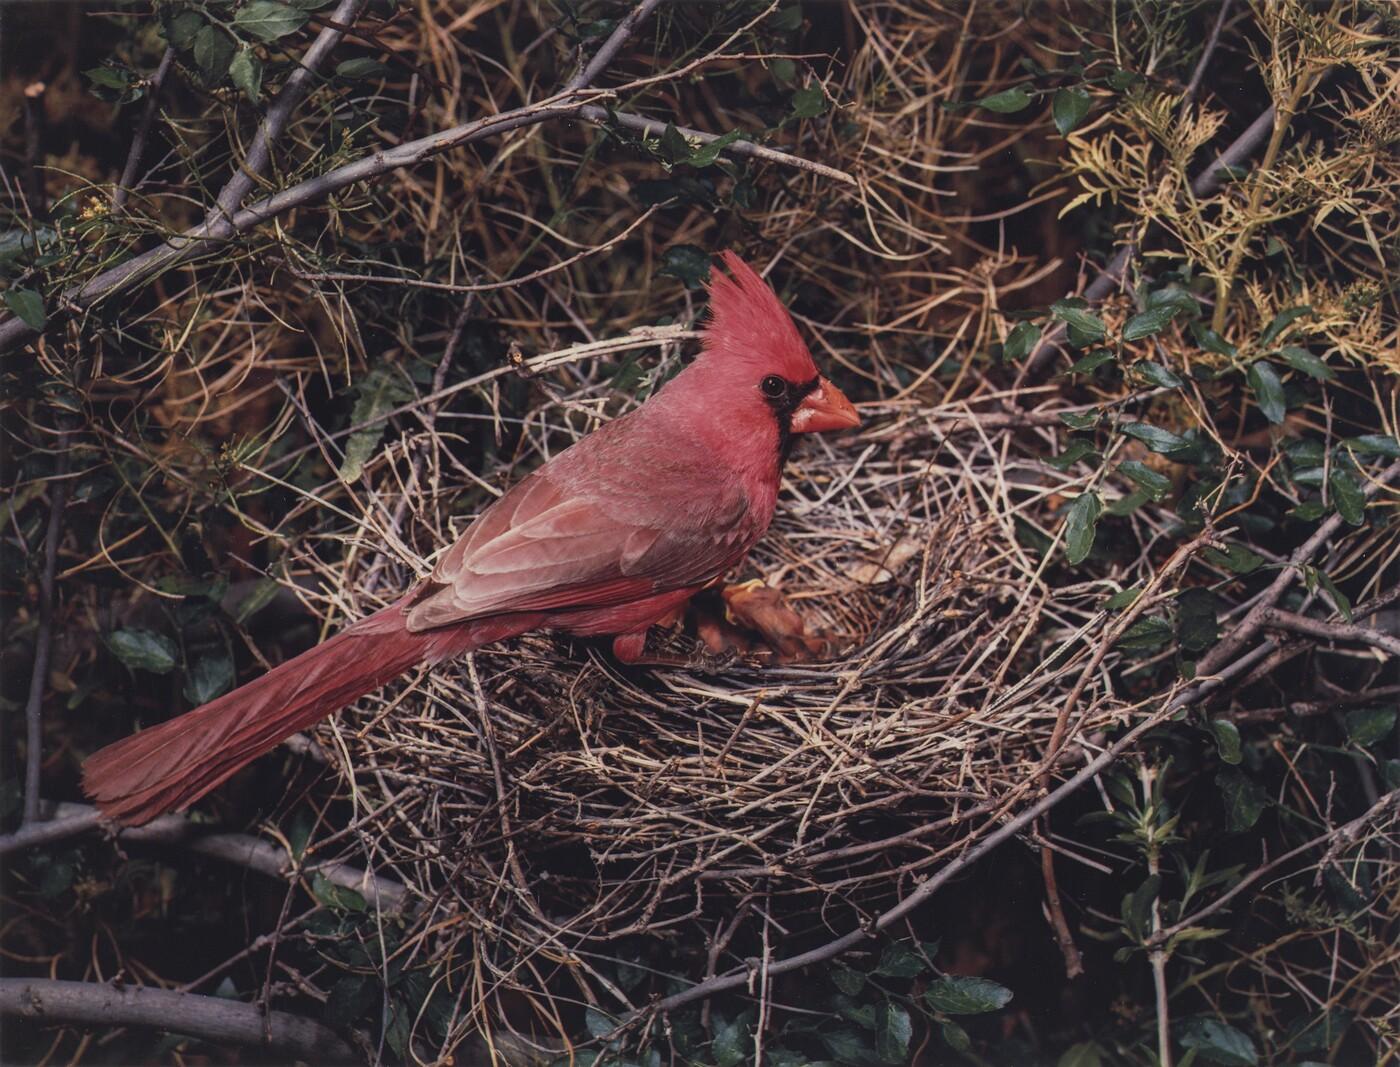 Eliot Porter (1901–1990), (Arizona) Northern Cardinal, Male, X-9 Ranch, Arizona, May 5-6, 1952